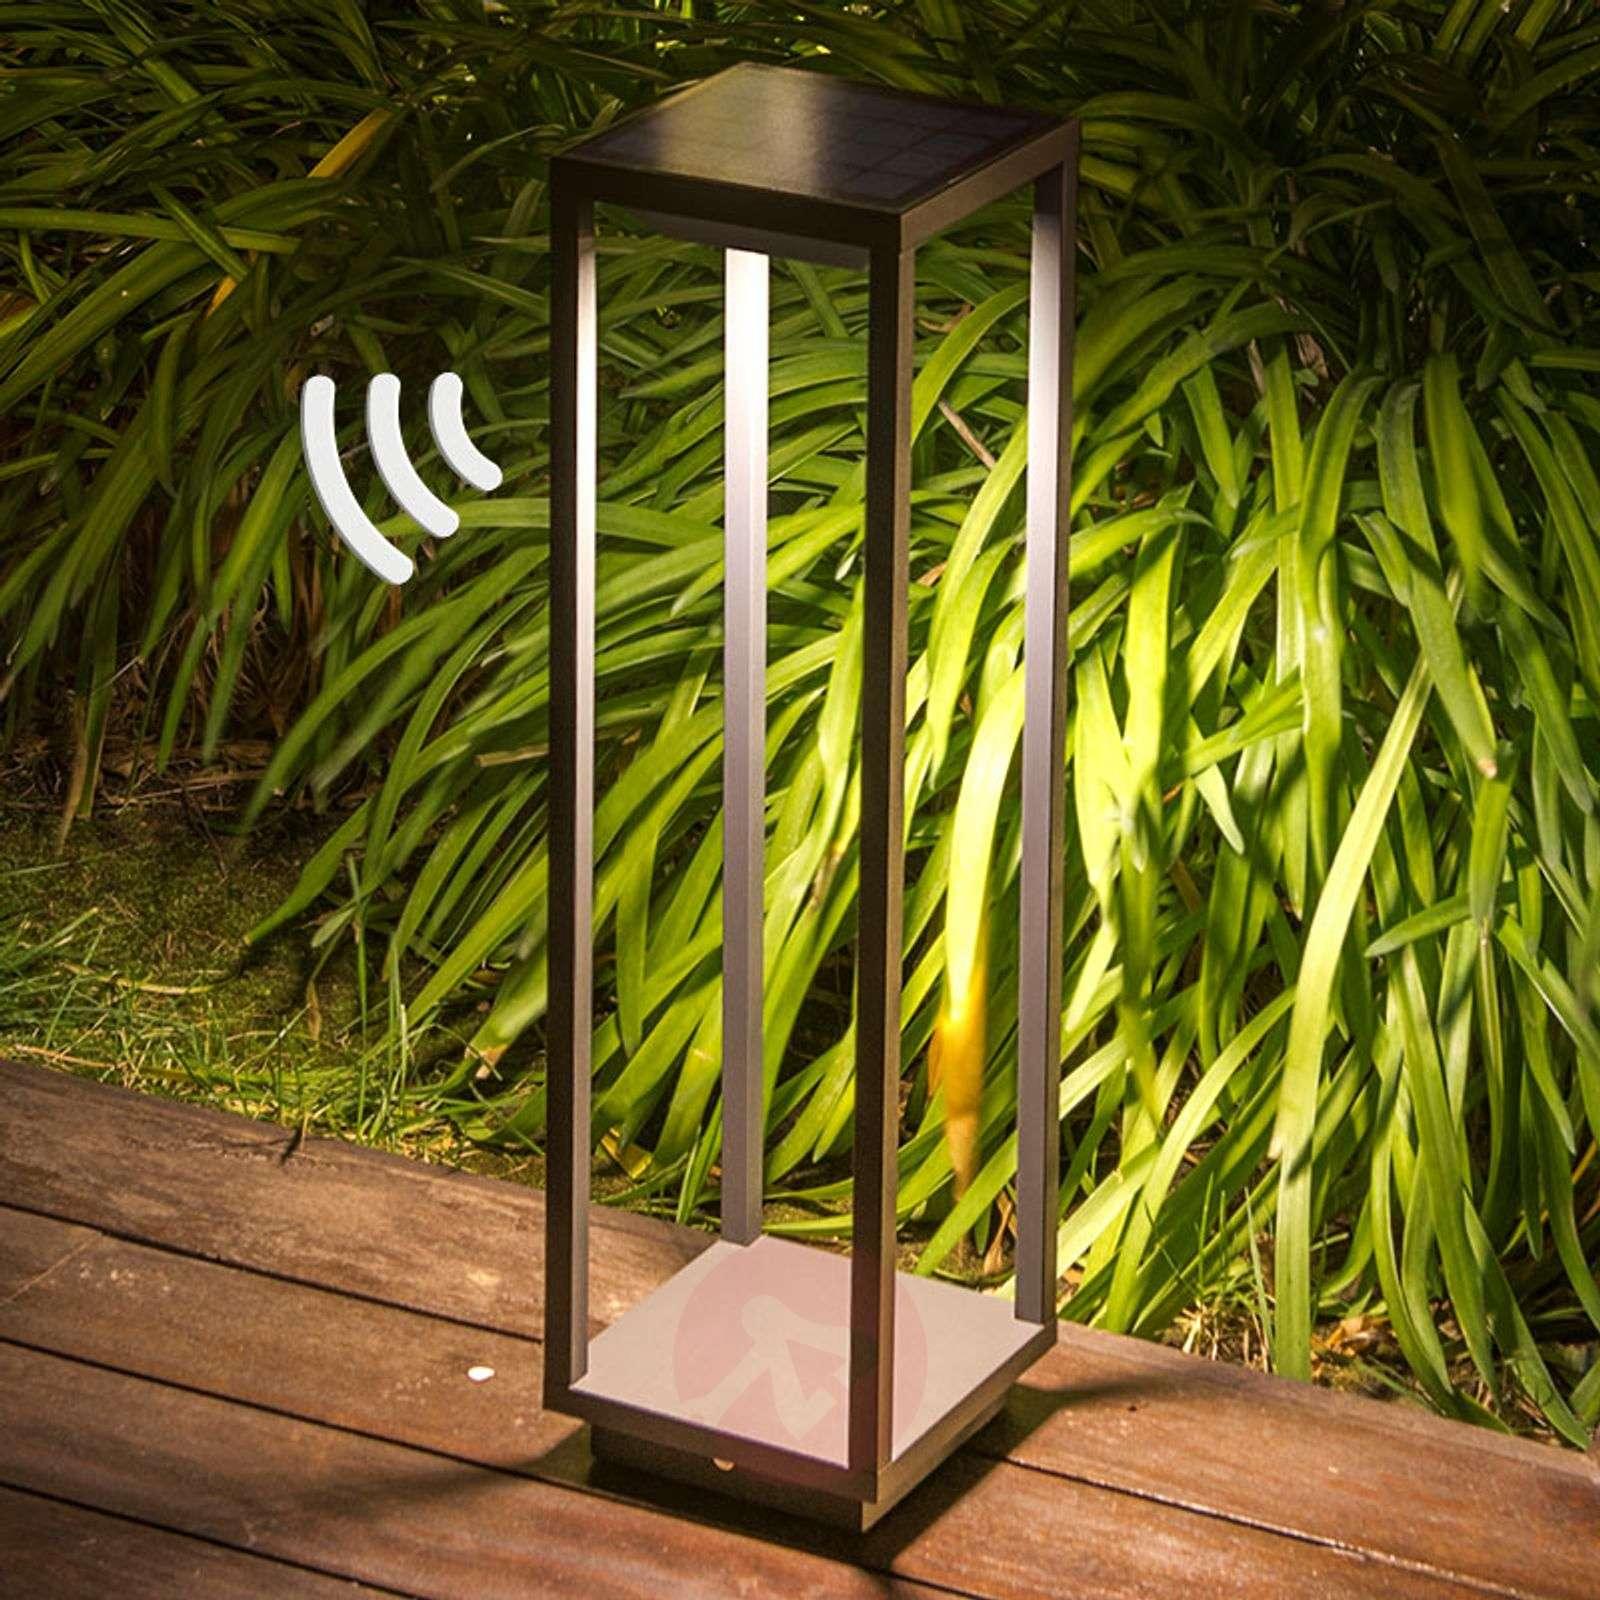 LED-pollarivalaisin Saura, liiketunnistimet-3507318-02